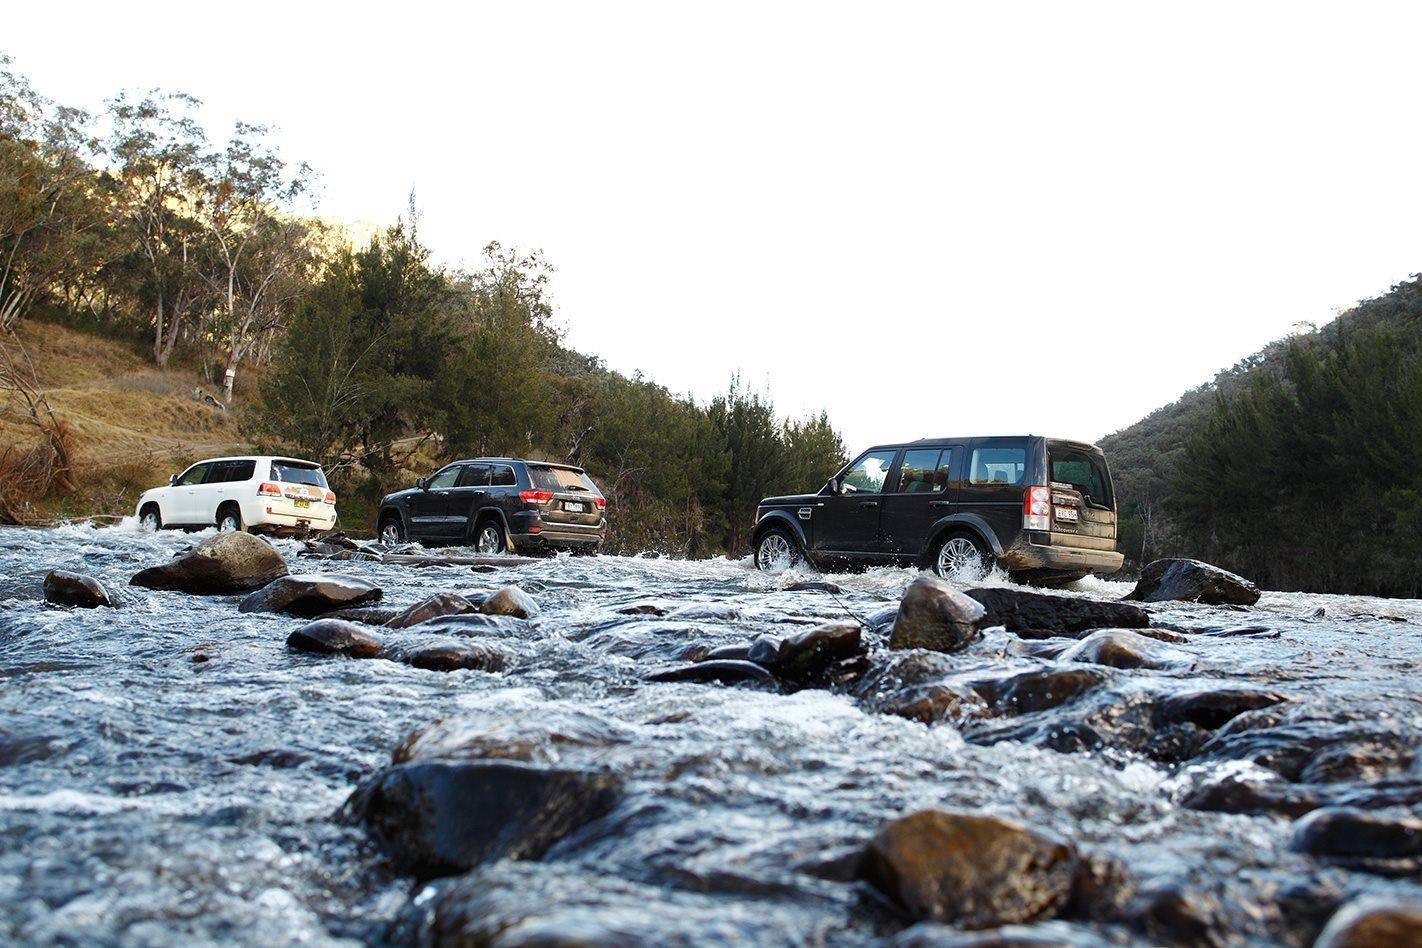 2011 Toyota LandCruiser 200 Series vs Land Rover Discovery 4 vs Jeep Grand Cherokee watercrossing.jpg